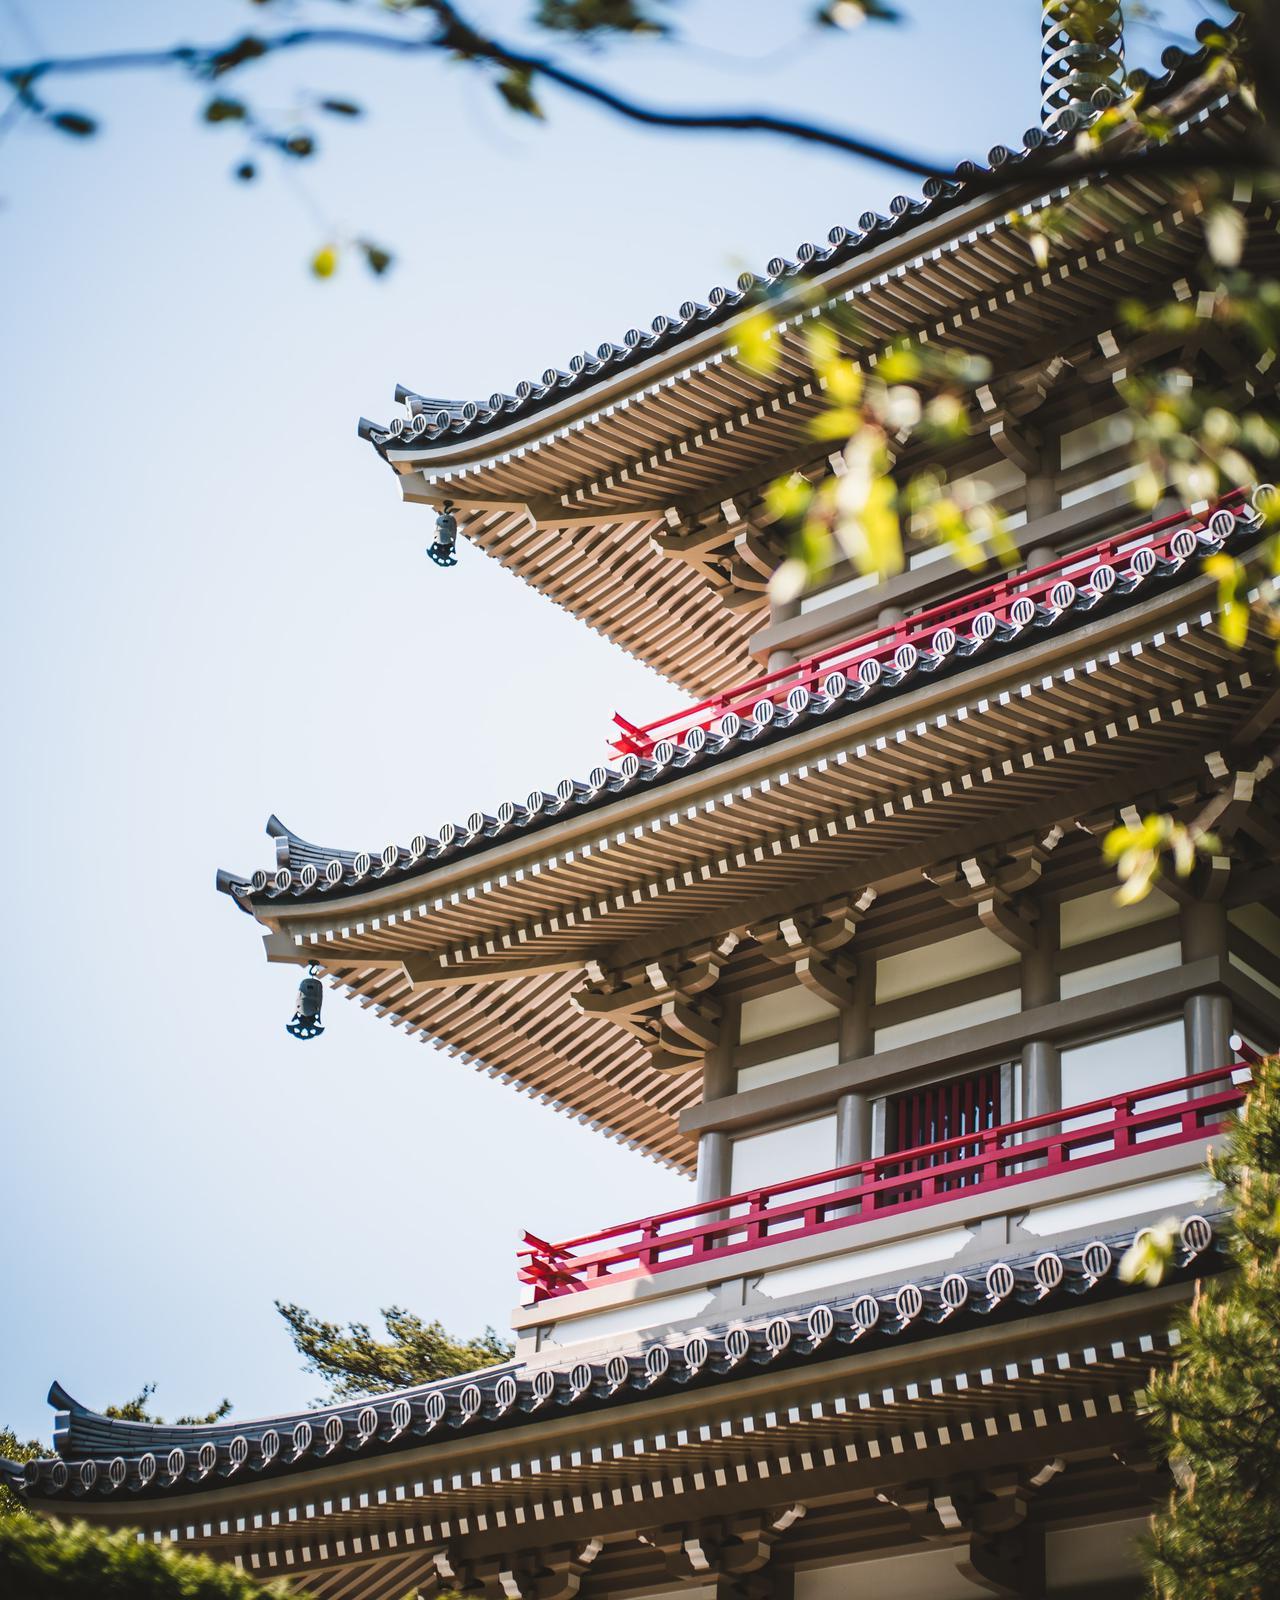 Beautiful pagoda at Rinnō-ji Temple, Sendai, Miyagi Prefecture.